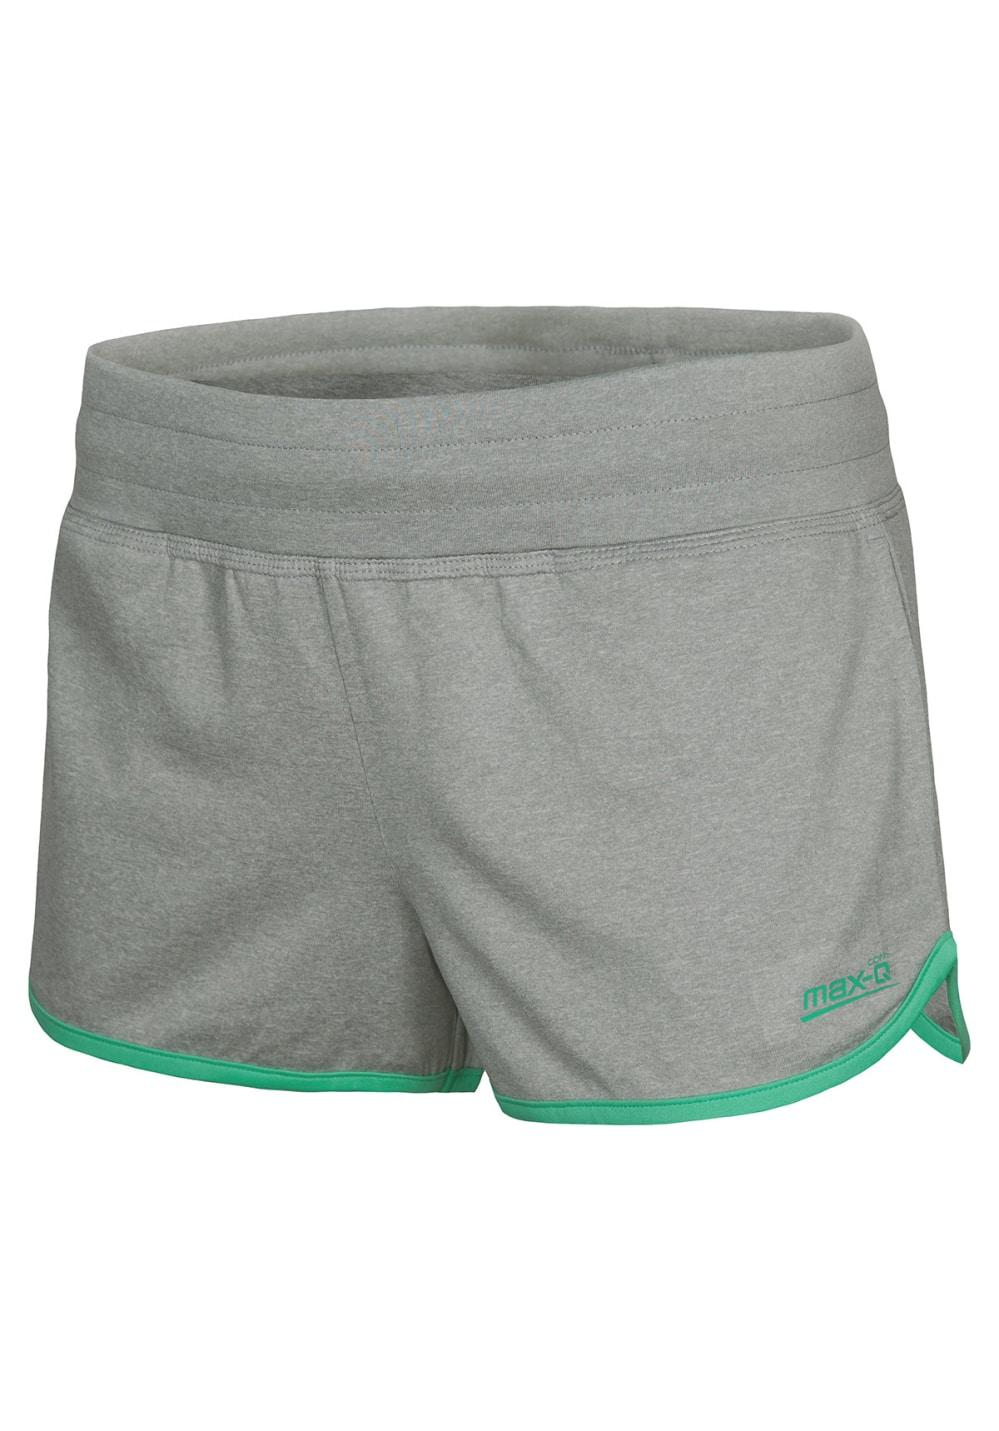 max-Q.com Free Kick X-Fit Short - Laufhosen für Damen - Grau